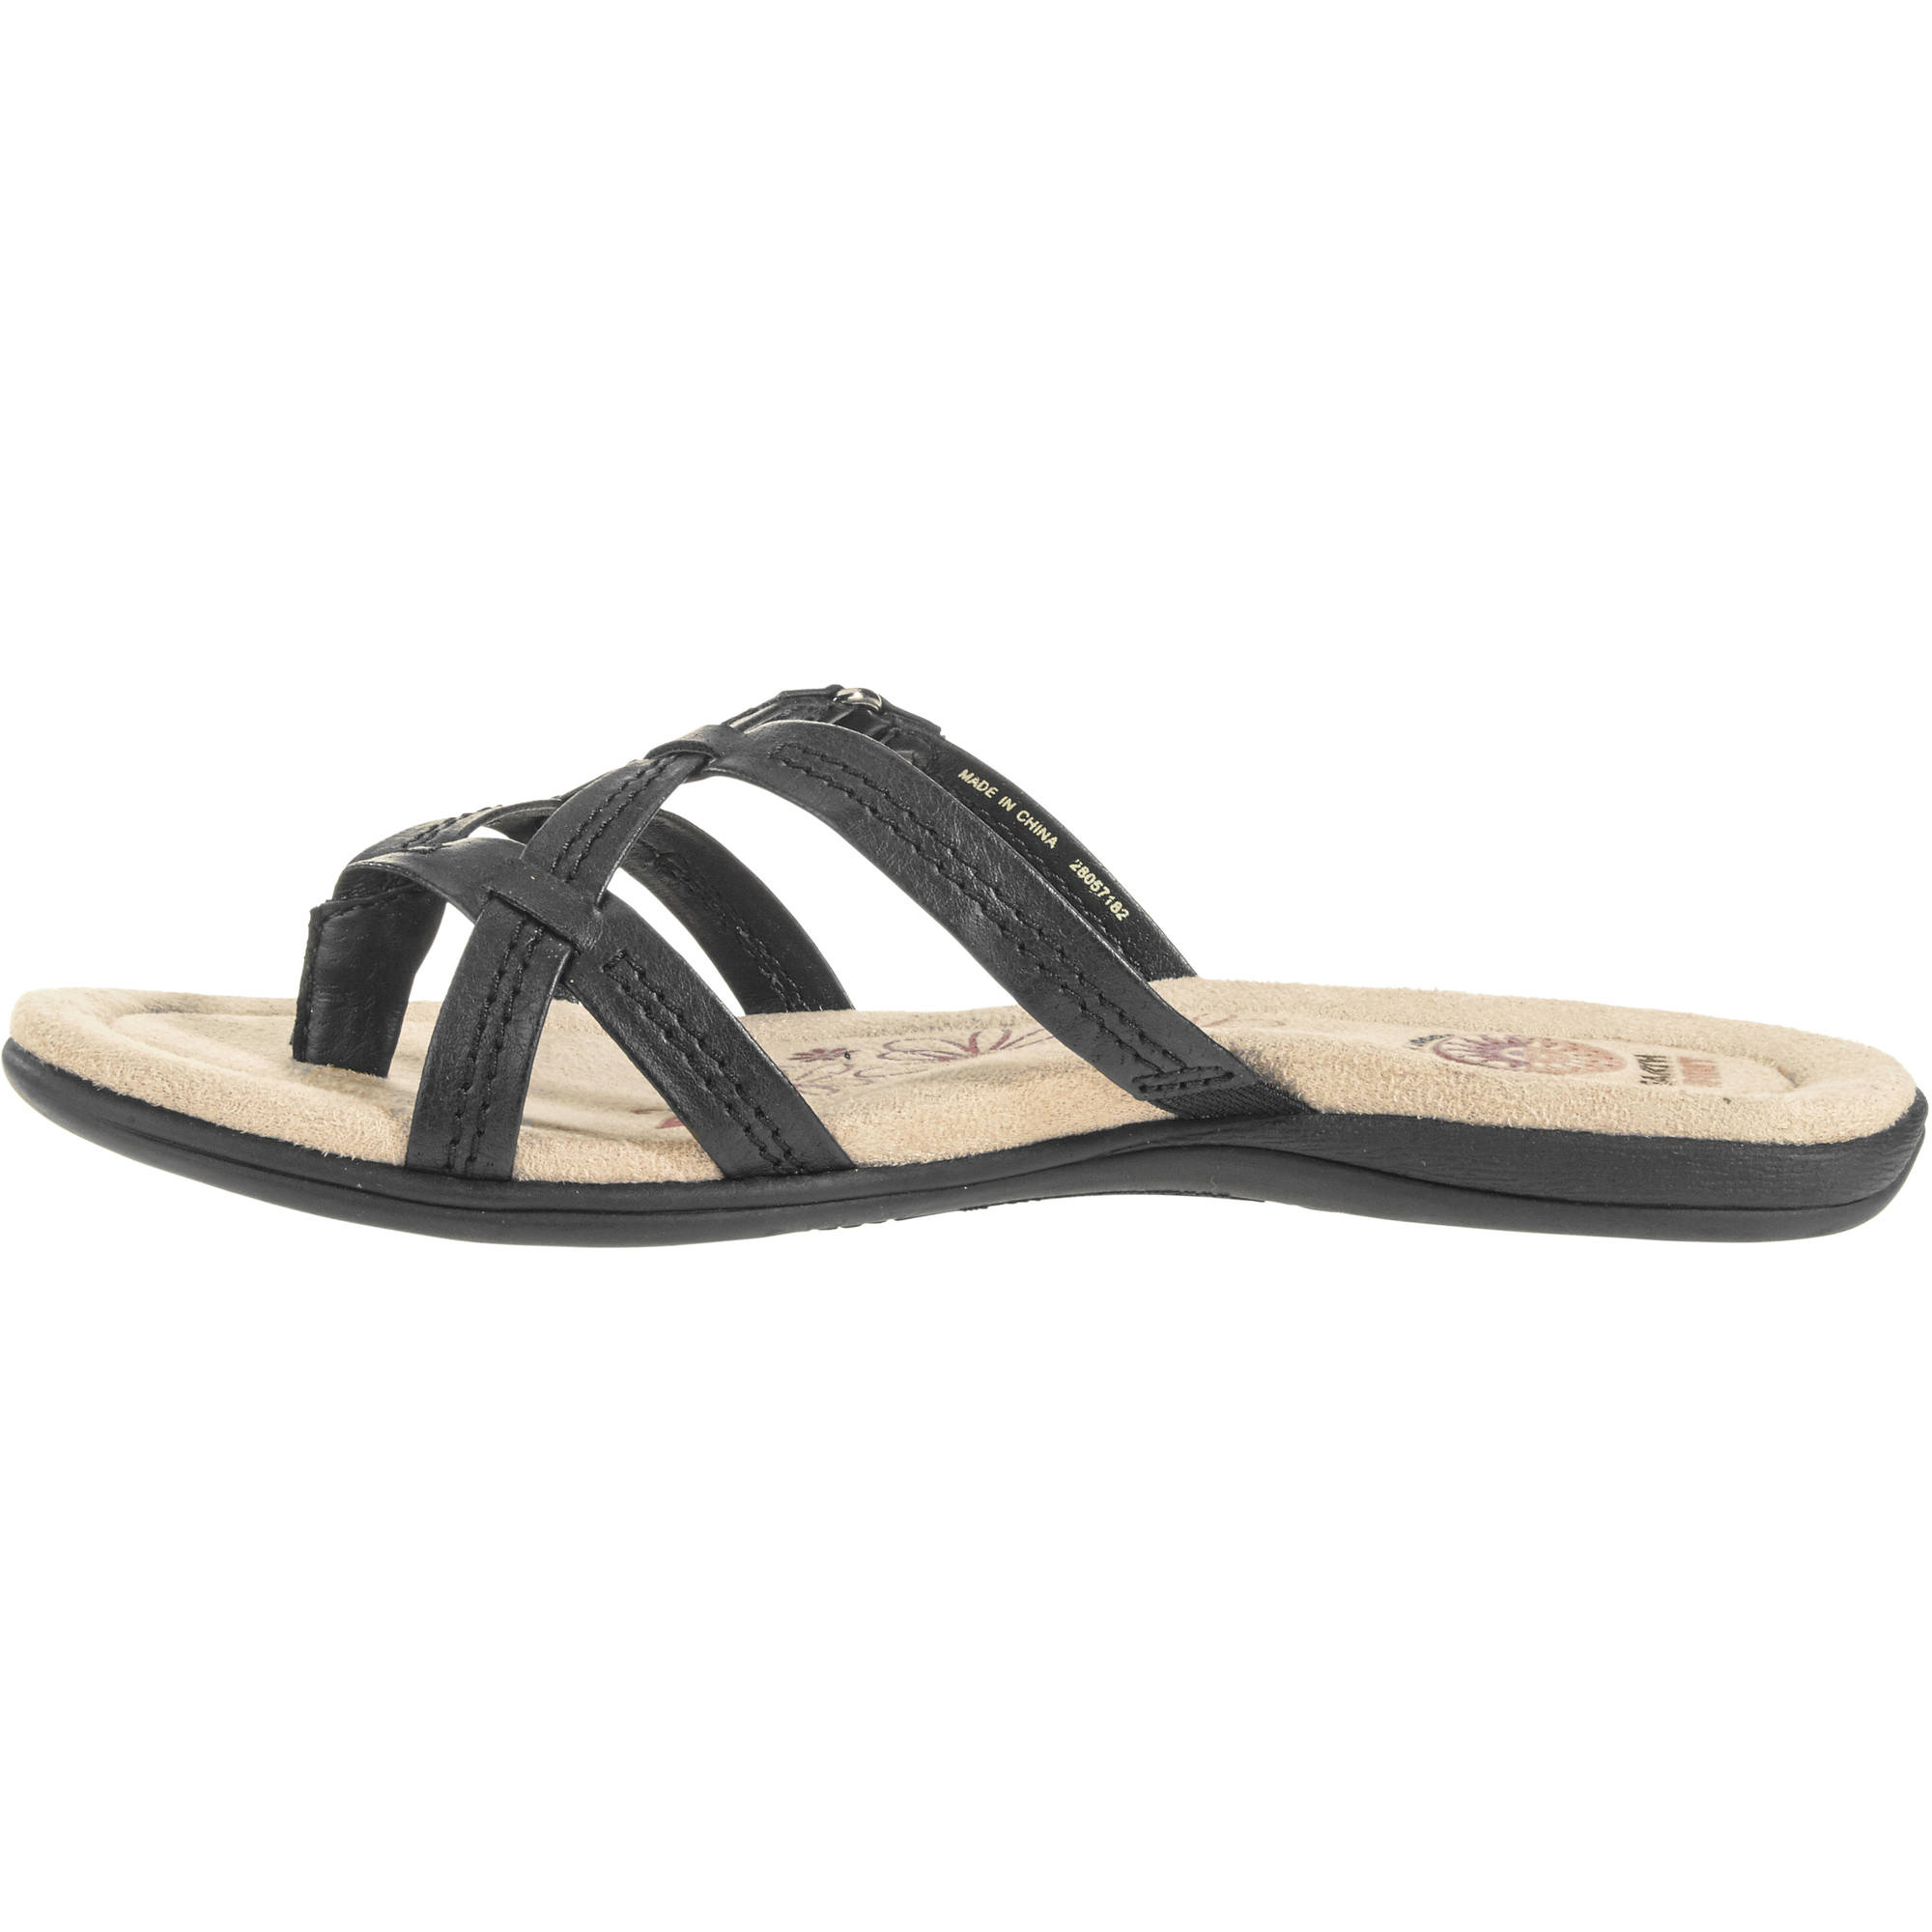 Womens sandals walmart - Womens Sandals Walmart 14